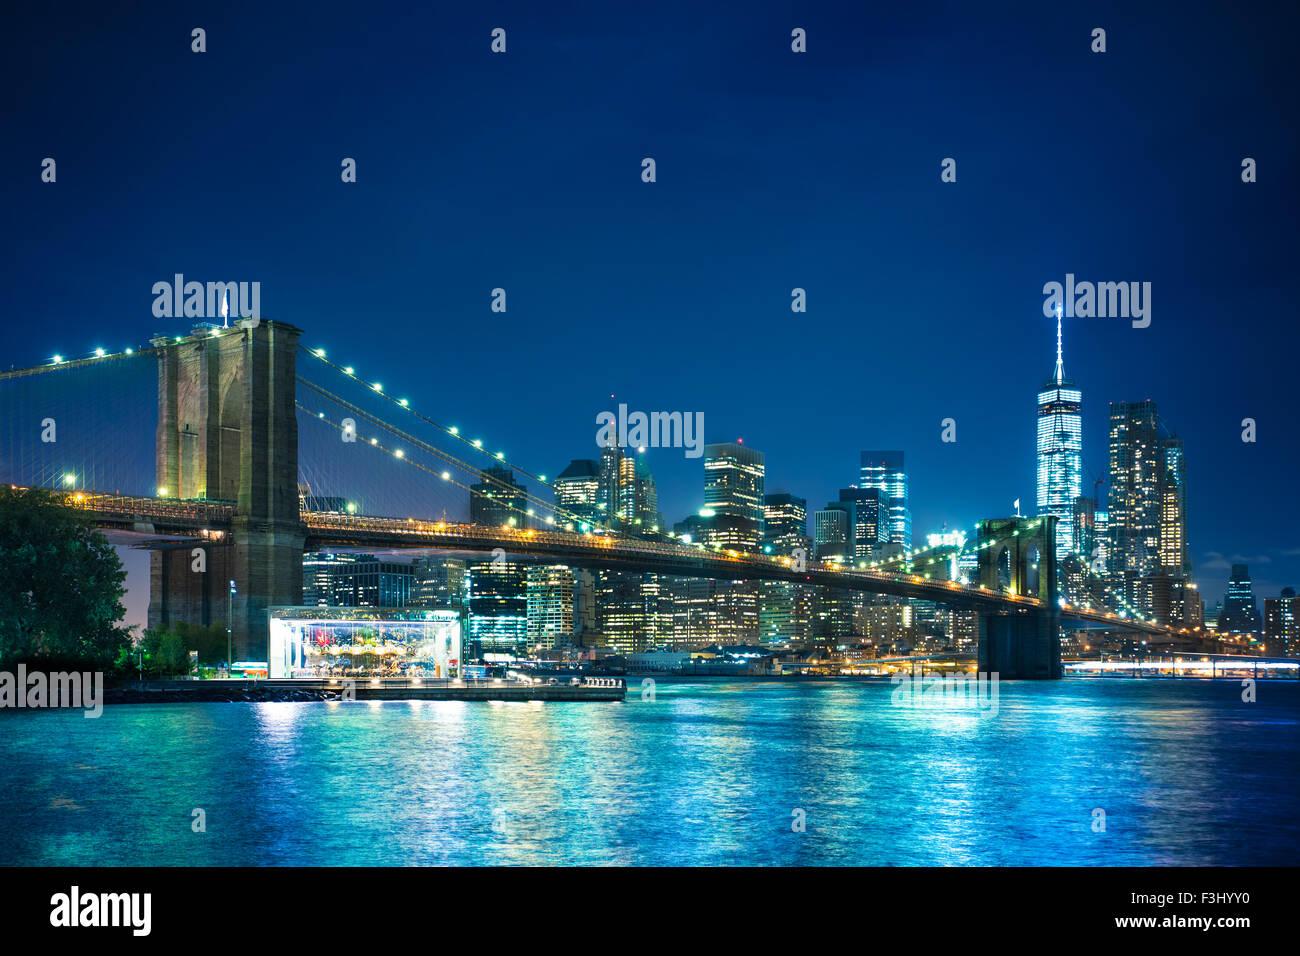 Beautiful night view of the Brooklyn Bridge looking towards Manhattan New York City - Stock Image